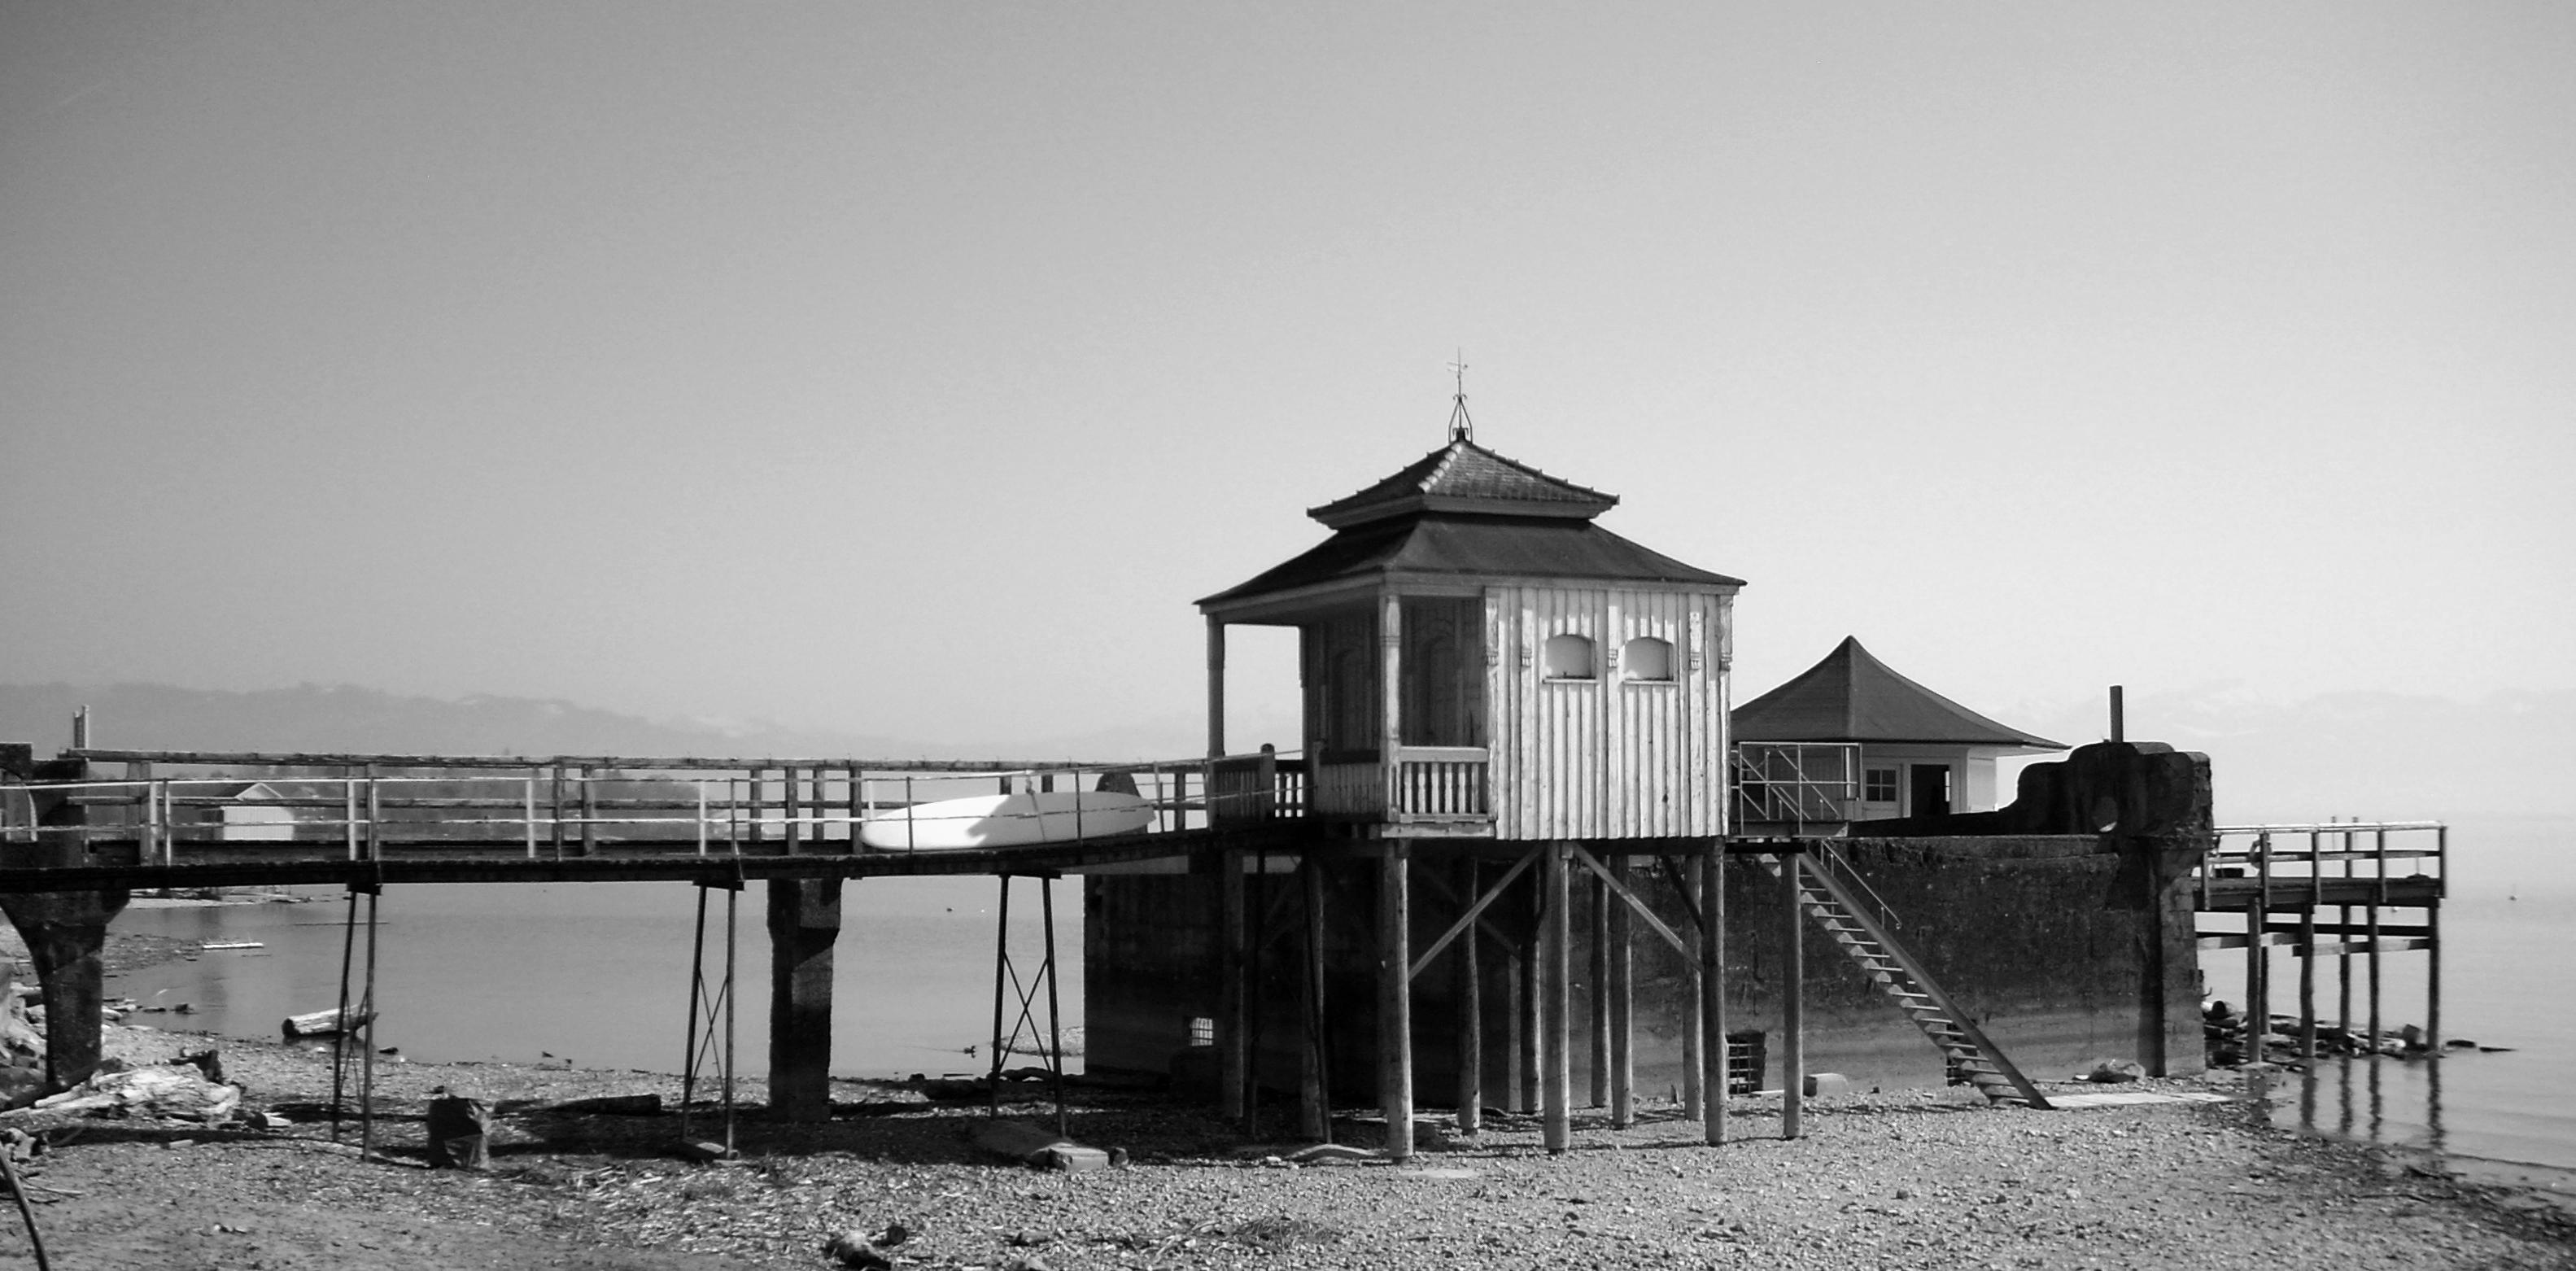 Strandhaus am Bodensee